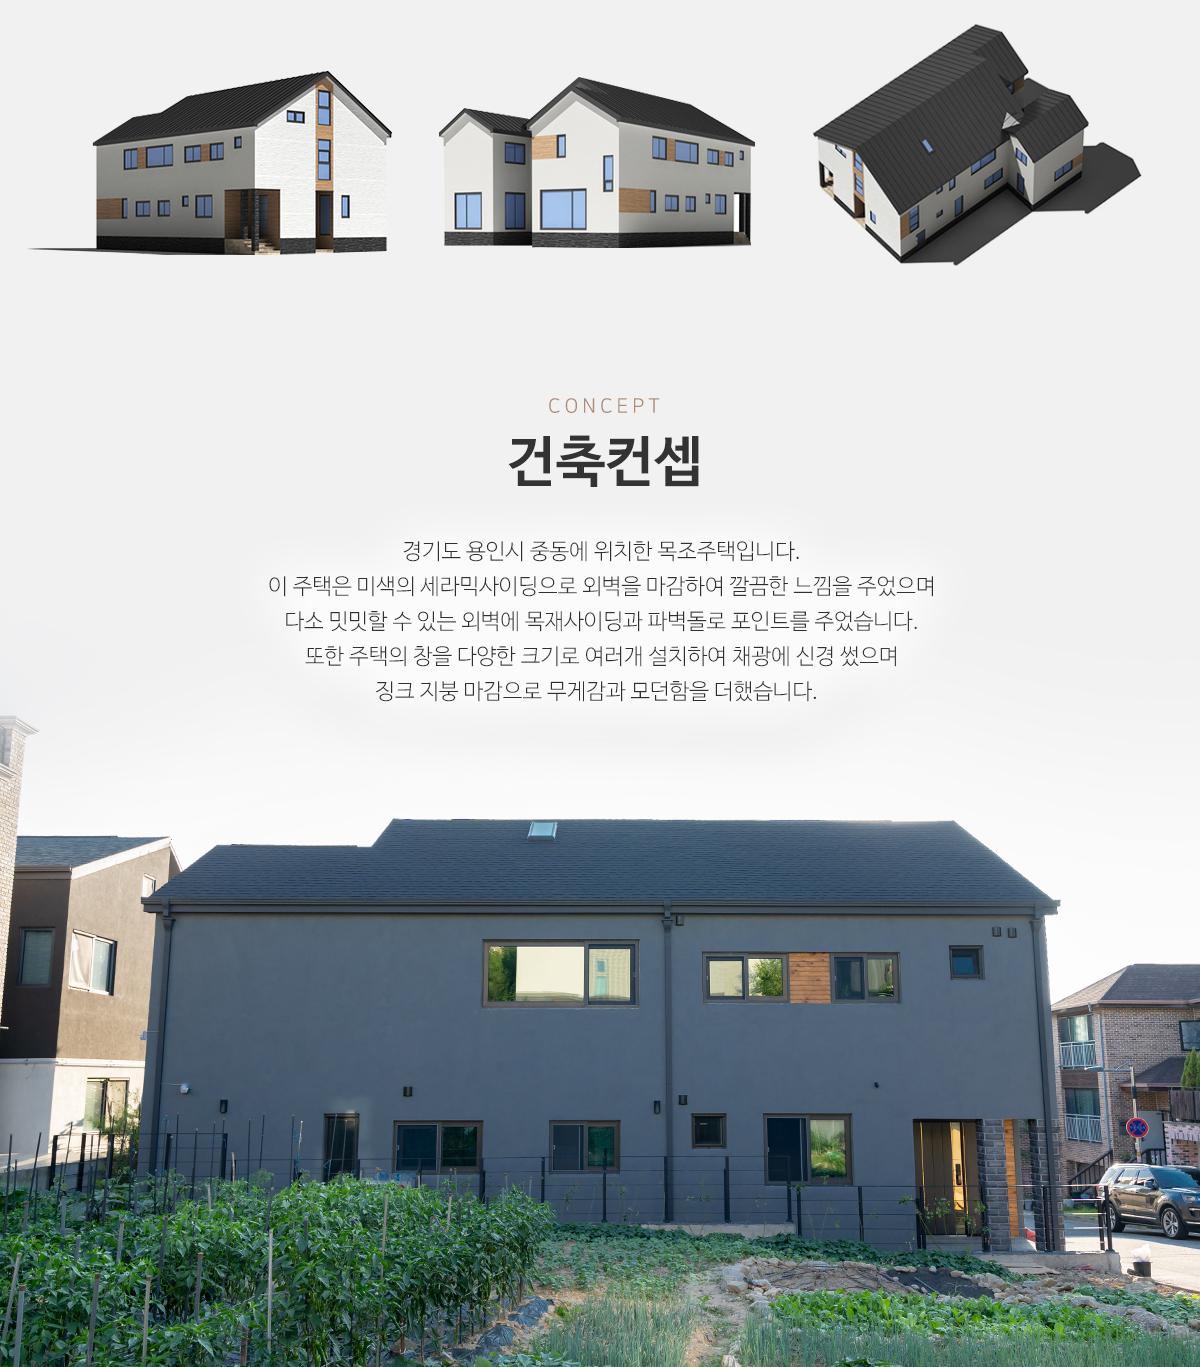 001_main_경기-용인-기흥구-중동_이문식_03.jpg